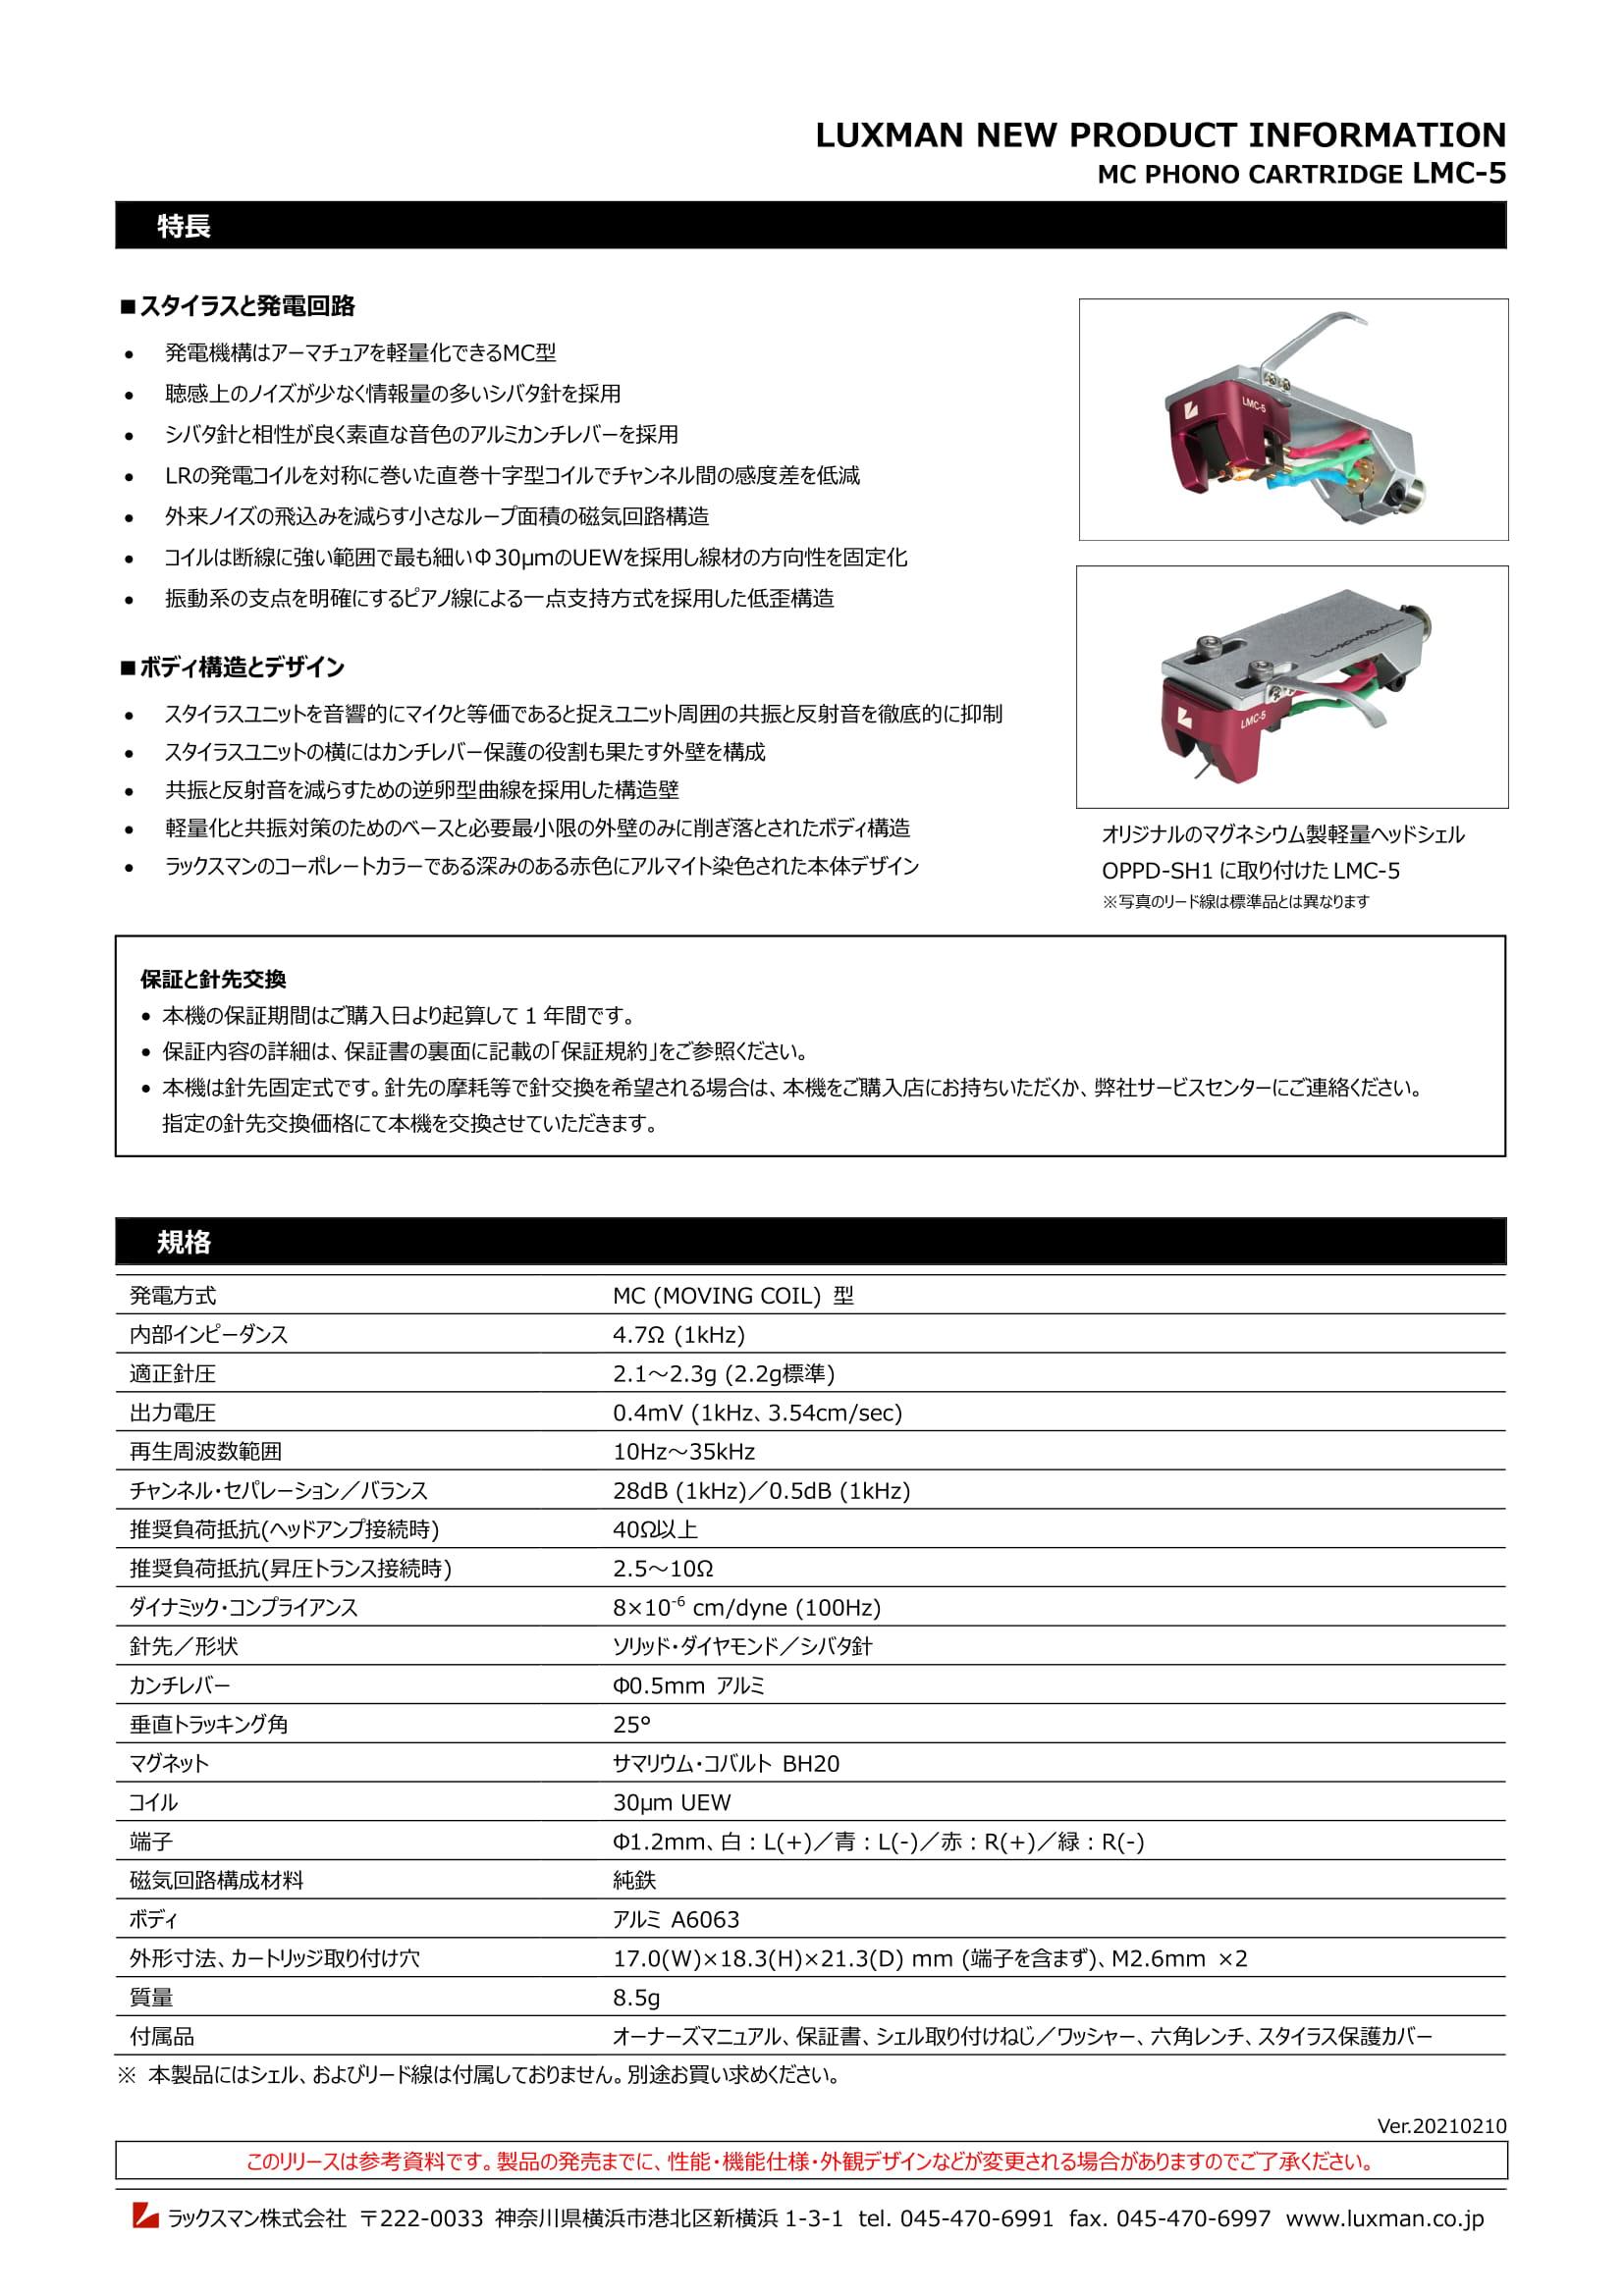 210219 LMC-5リリース-2